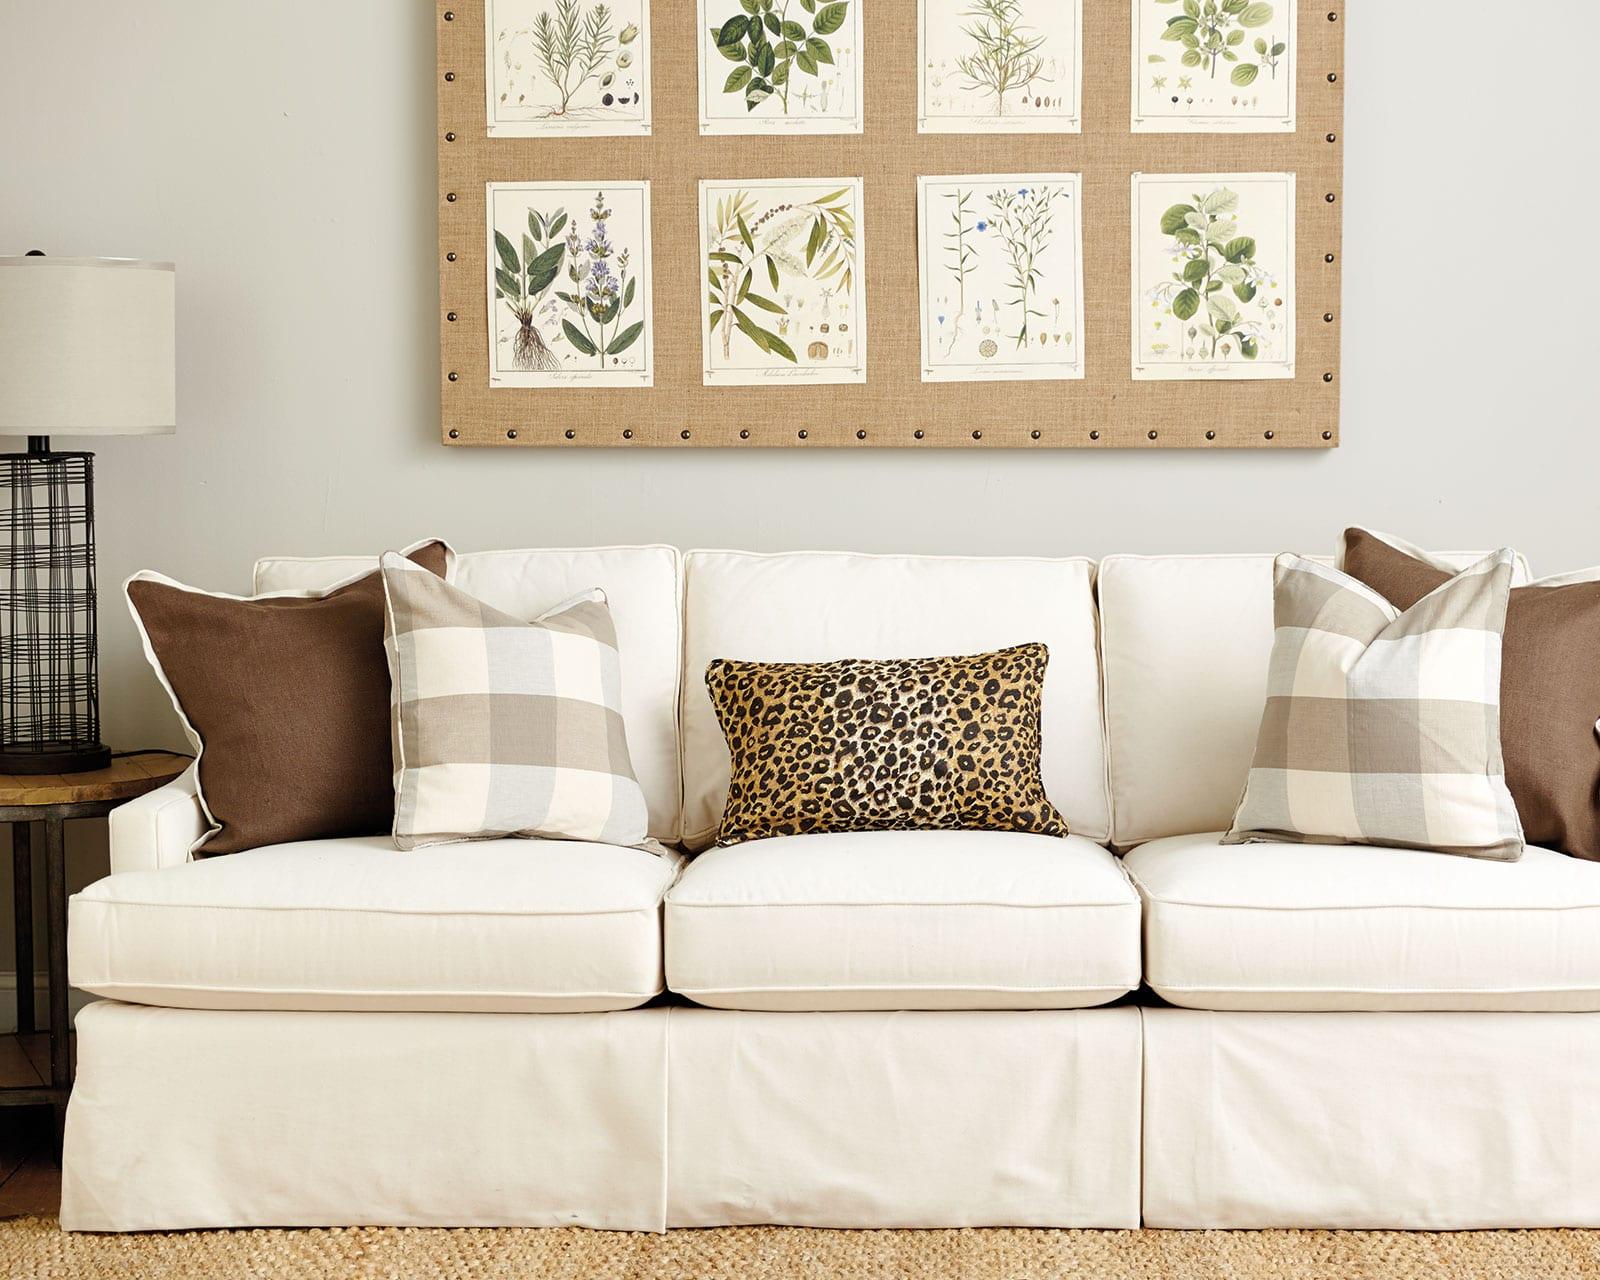 navy sofa beige walls sleeper sacramento ca guide to choosing throw pillows how decorate